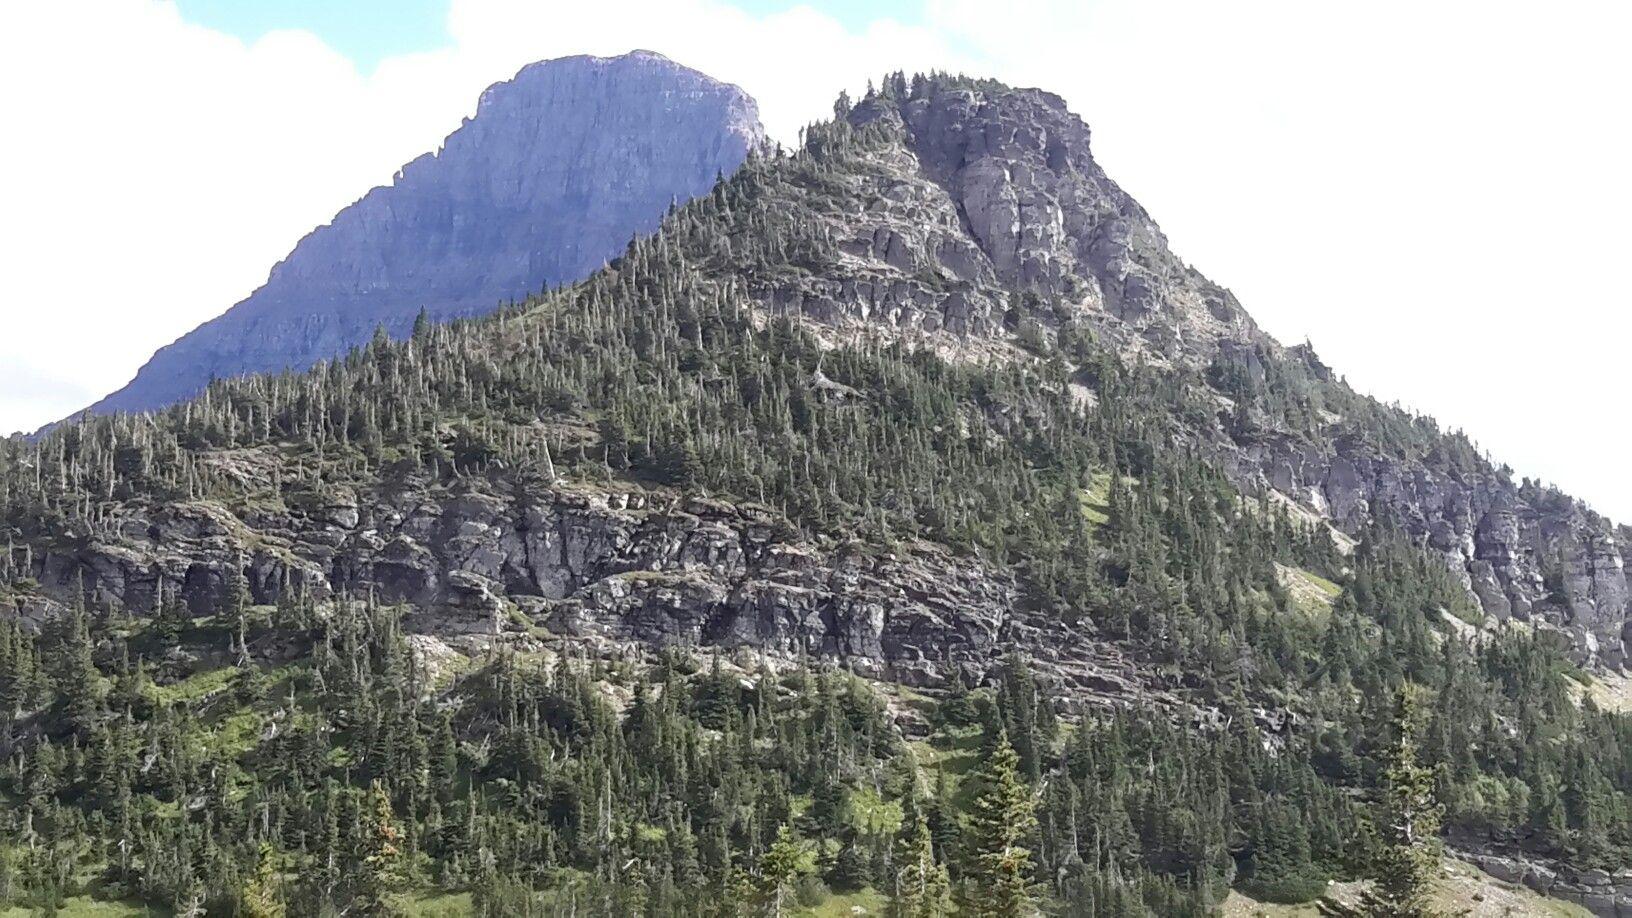 Pin by Douglas Wilke on Montana. Natural landmarks, City